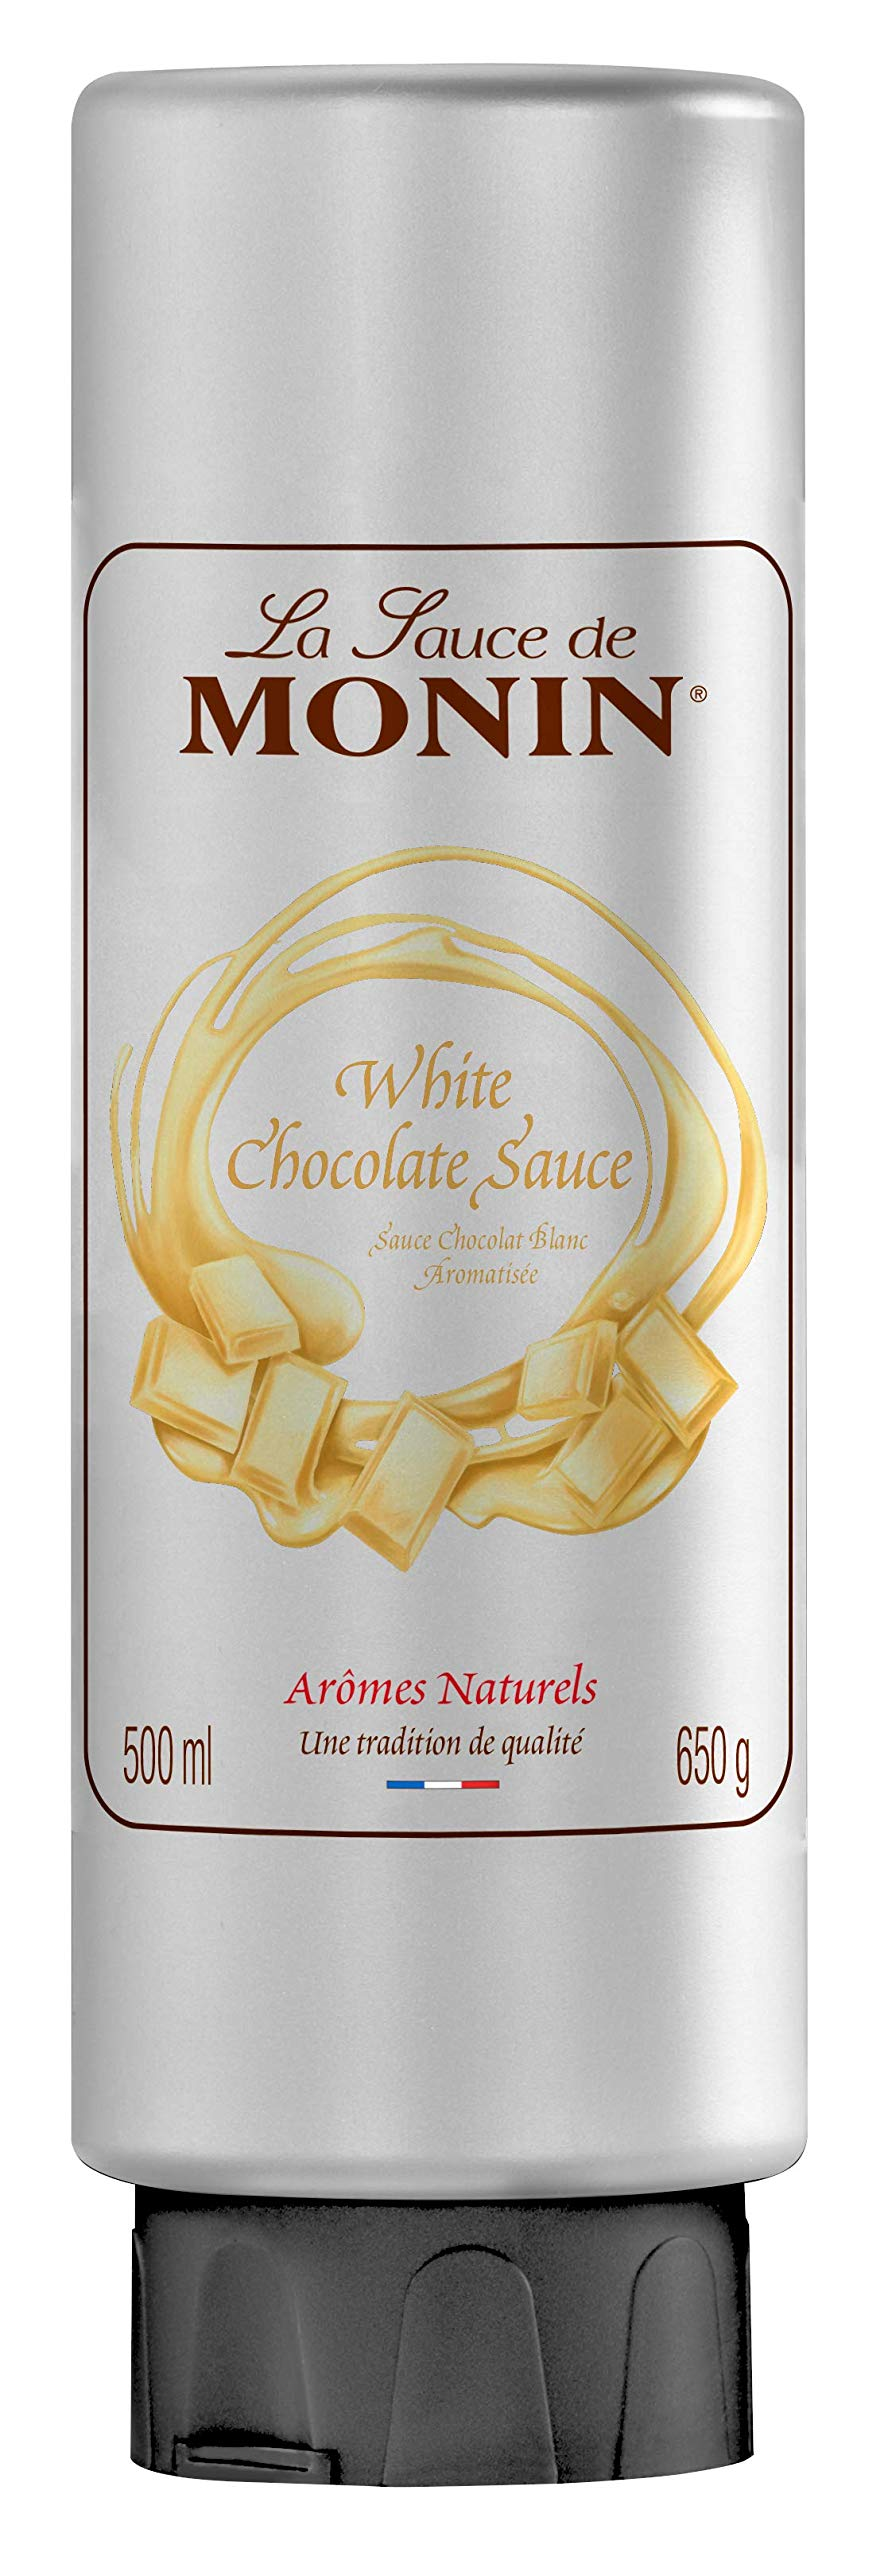 La Sauce de MONIN White Chocolate 500 ml